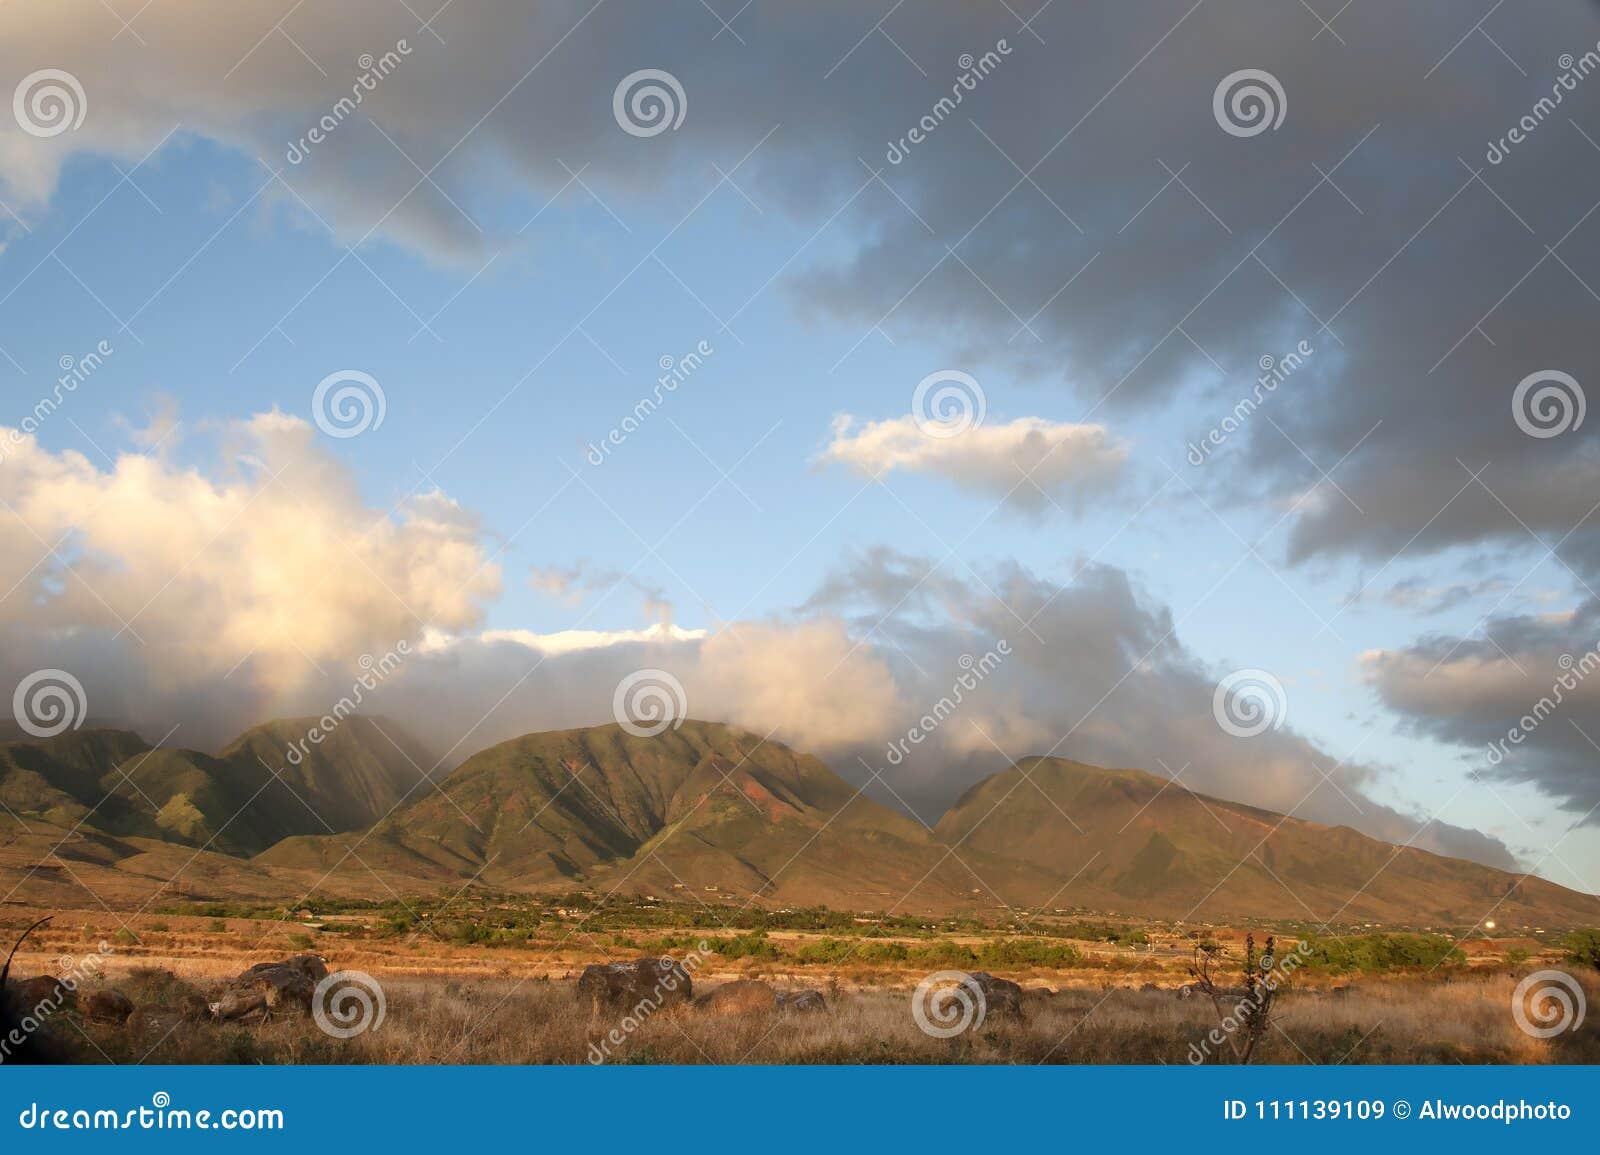 legújabb kollekció online rendelés forró termékek Clouds Over West Maui Mountains In Hawaii Stock Image - Image of ...